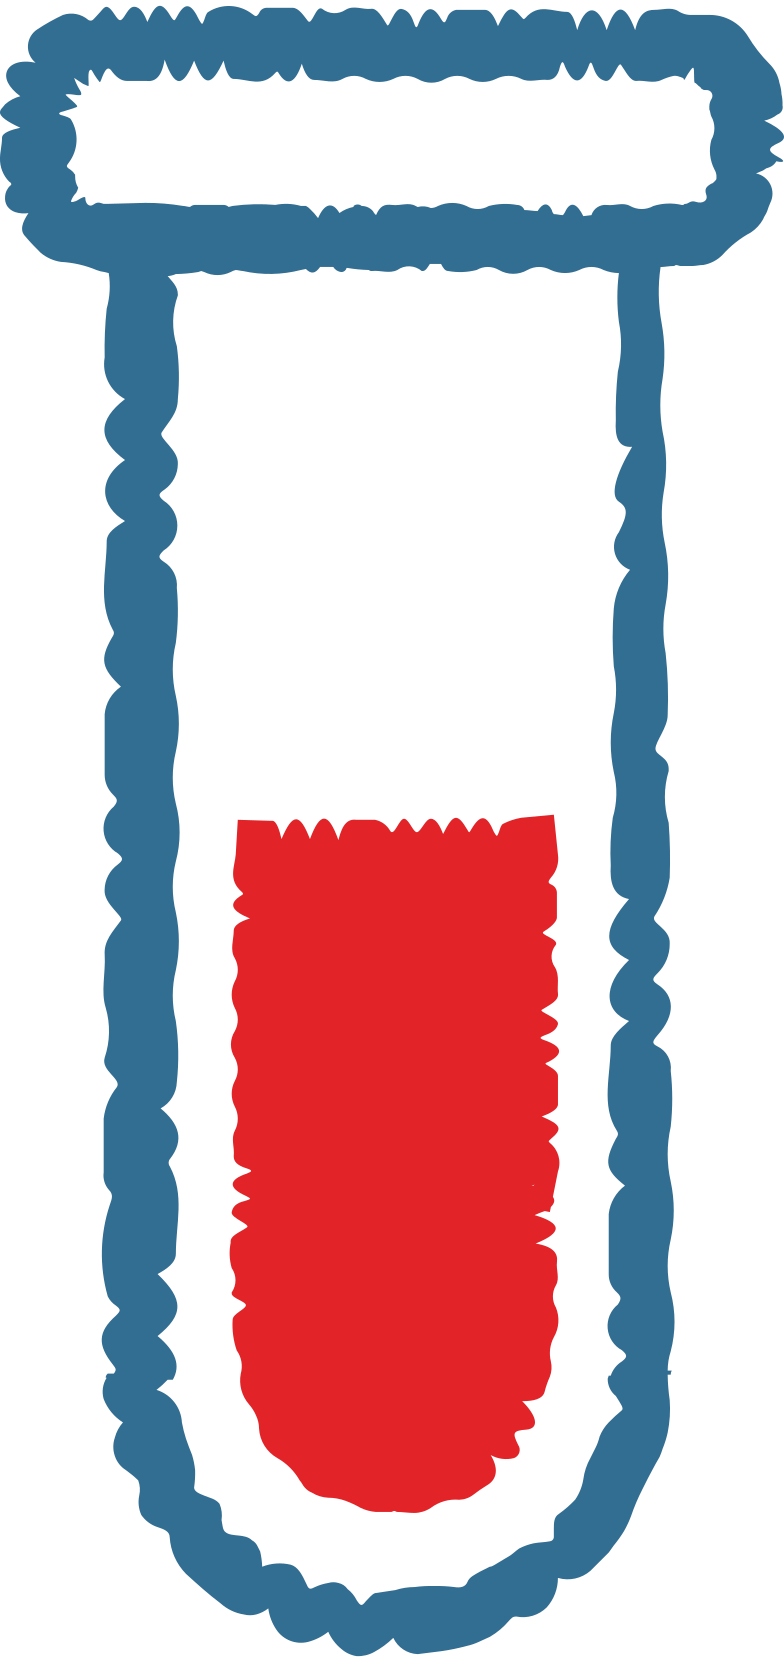 Tubo de ensaio Clipart illustration in PNG, SVG